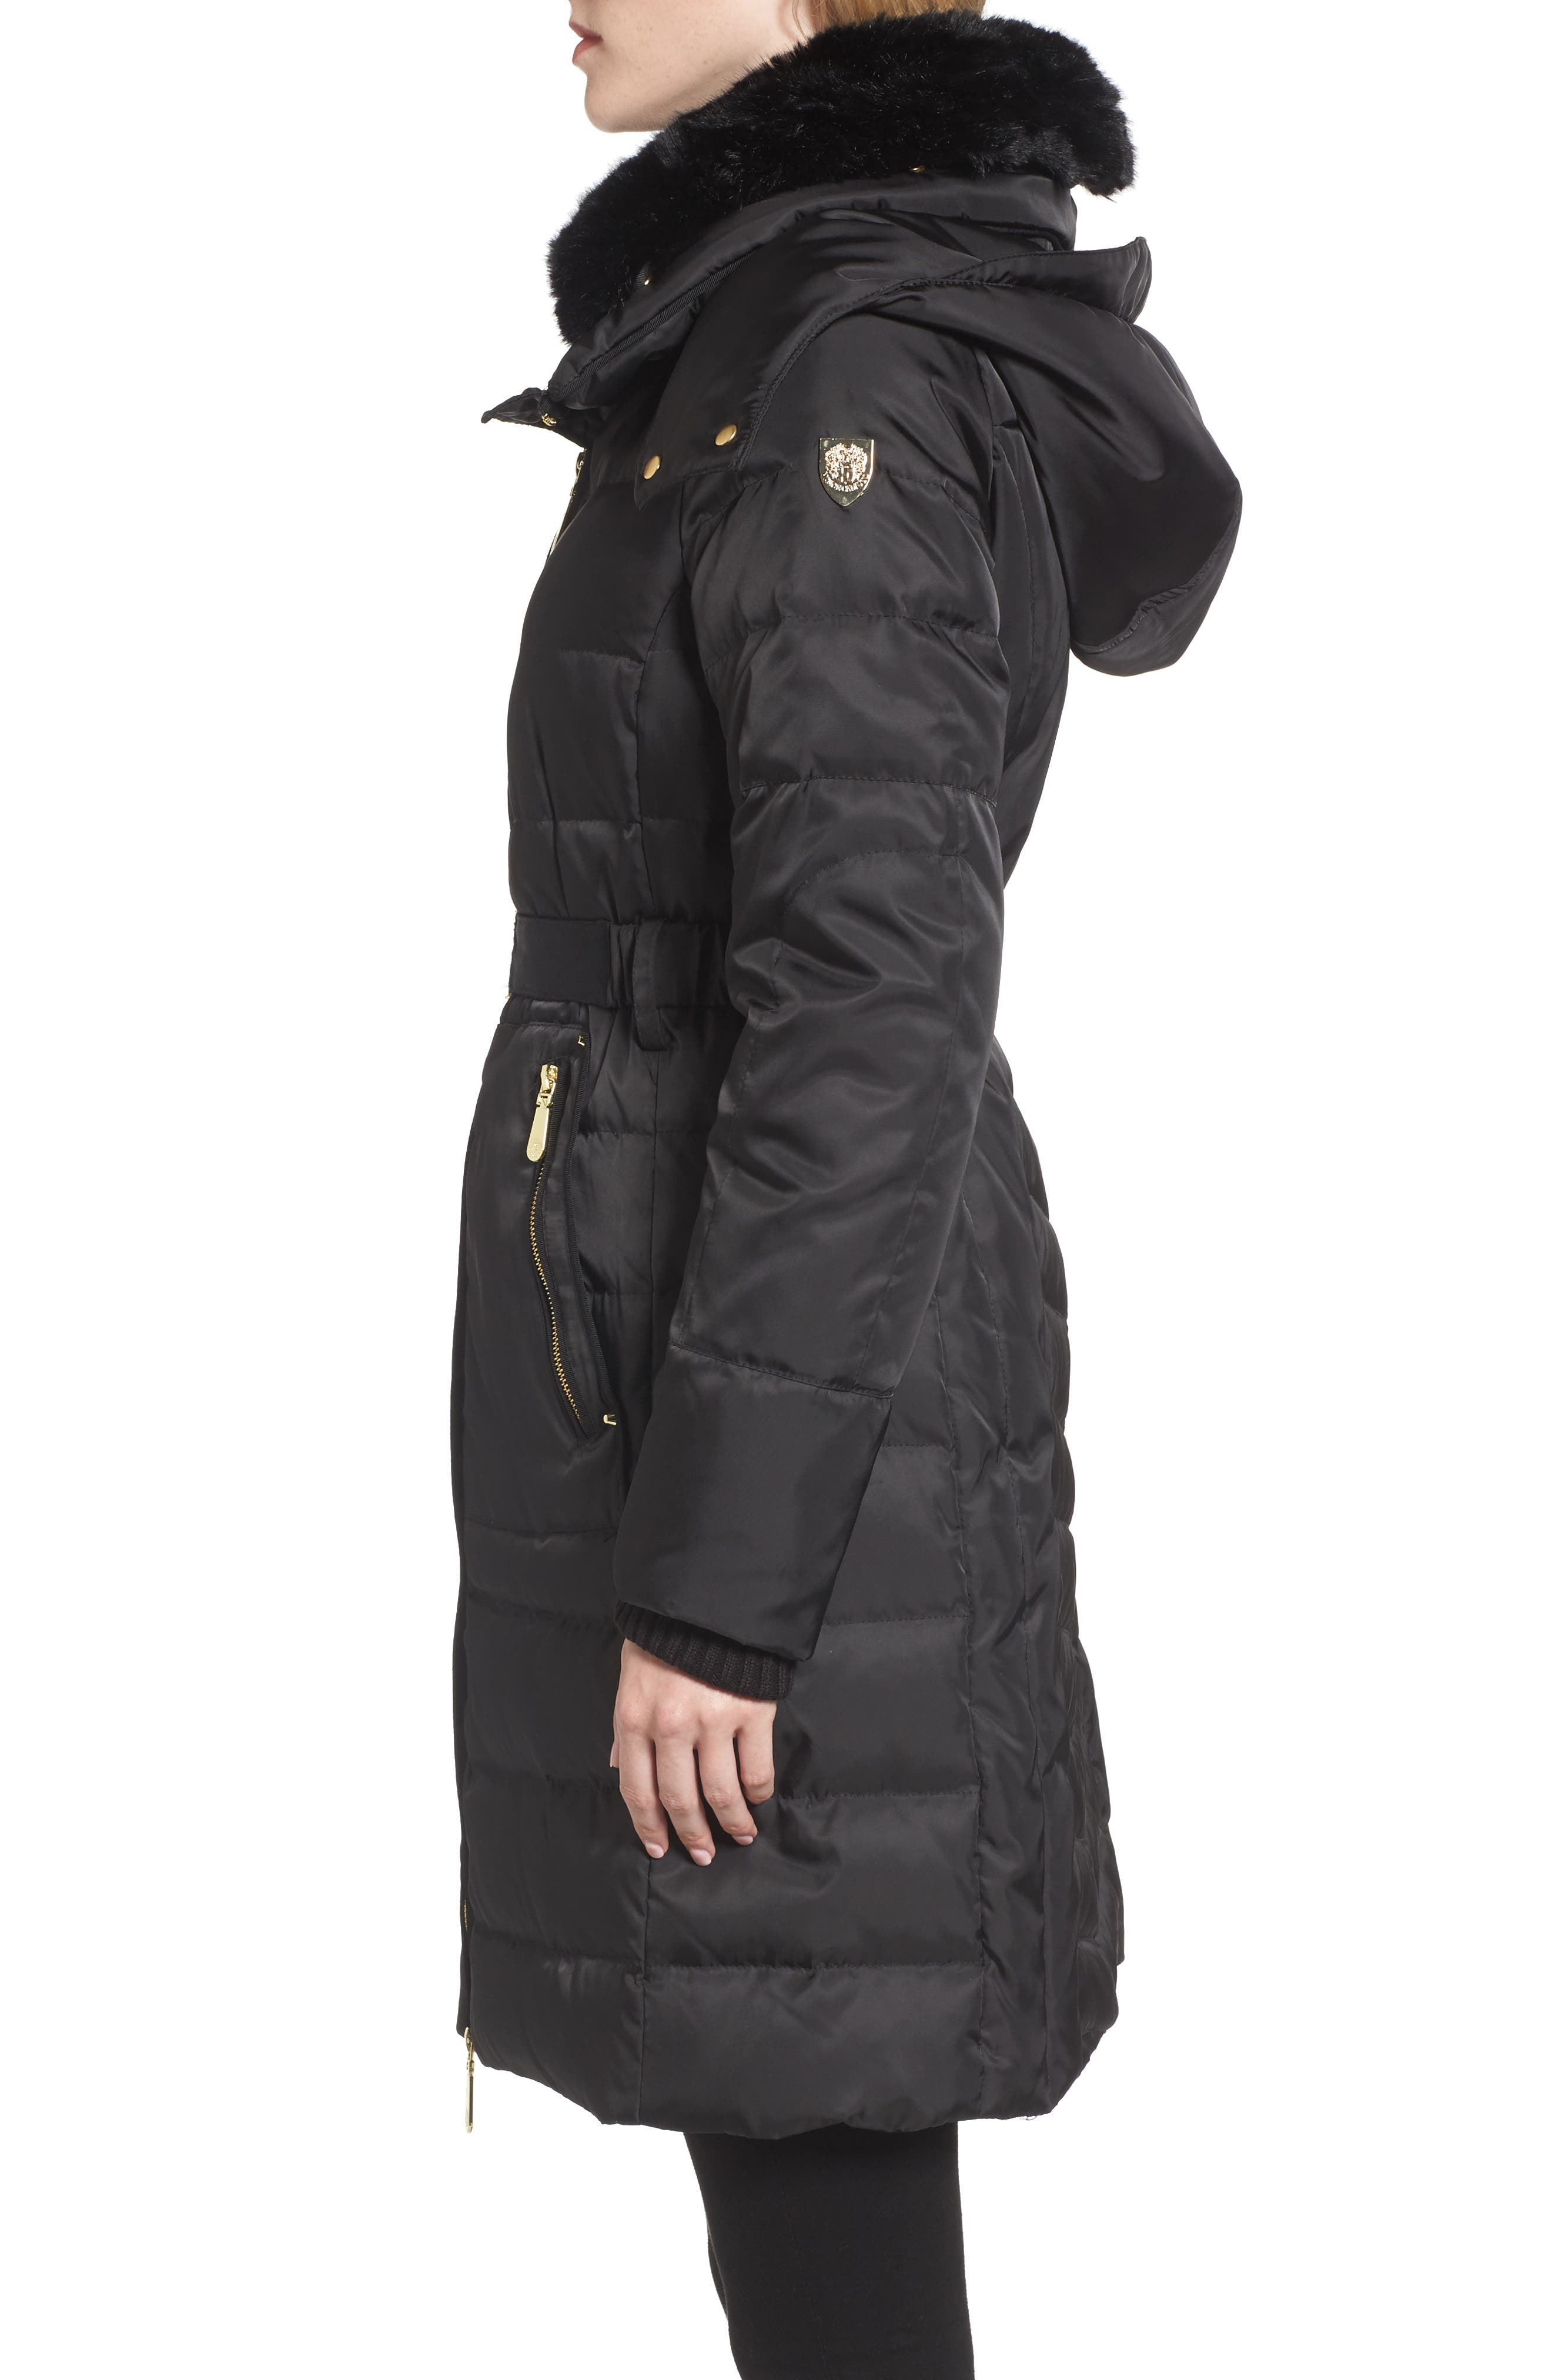 Belted Coat with Detachable Faux Fur,                             Alternate thumbnail 3, color,                             Black